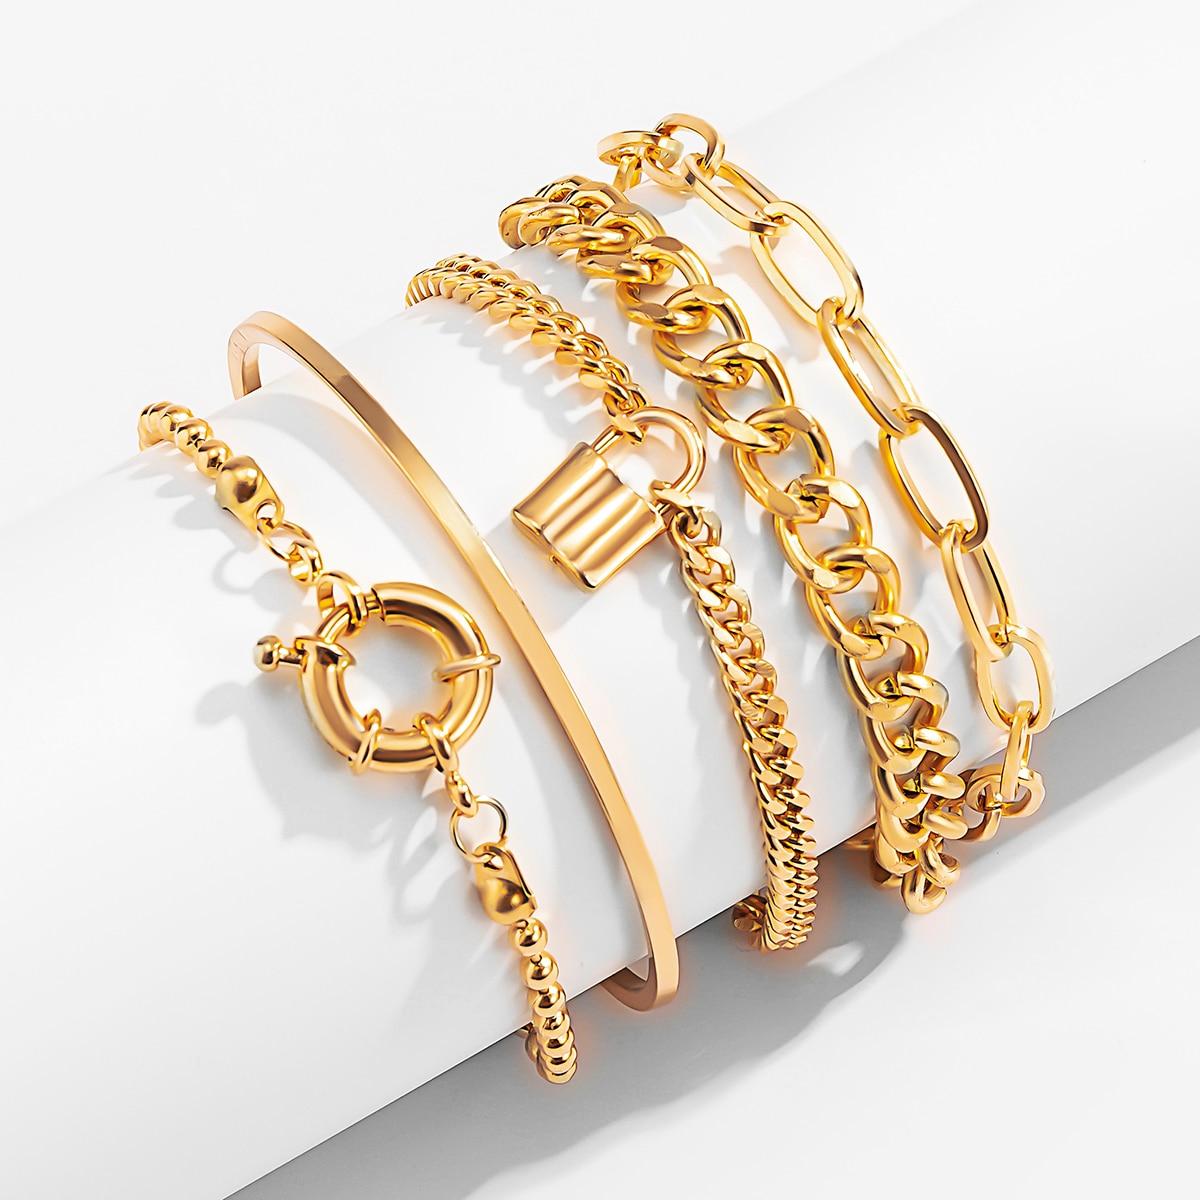 PuRui 5PCS/set Multilayer Gold Color Chain Bracelets & Bangles for Women Men Lock Chunky Bracelet Couples Boho Jewelry Gift